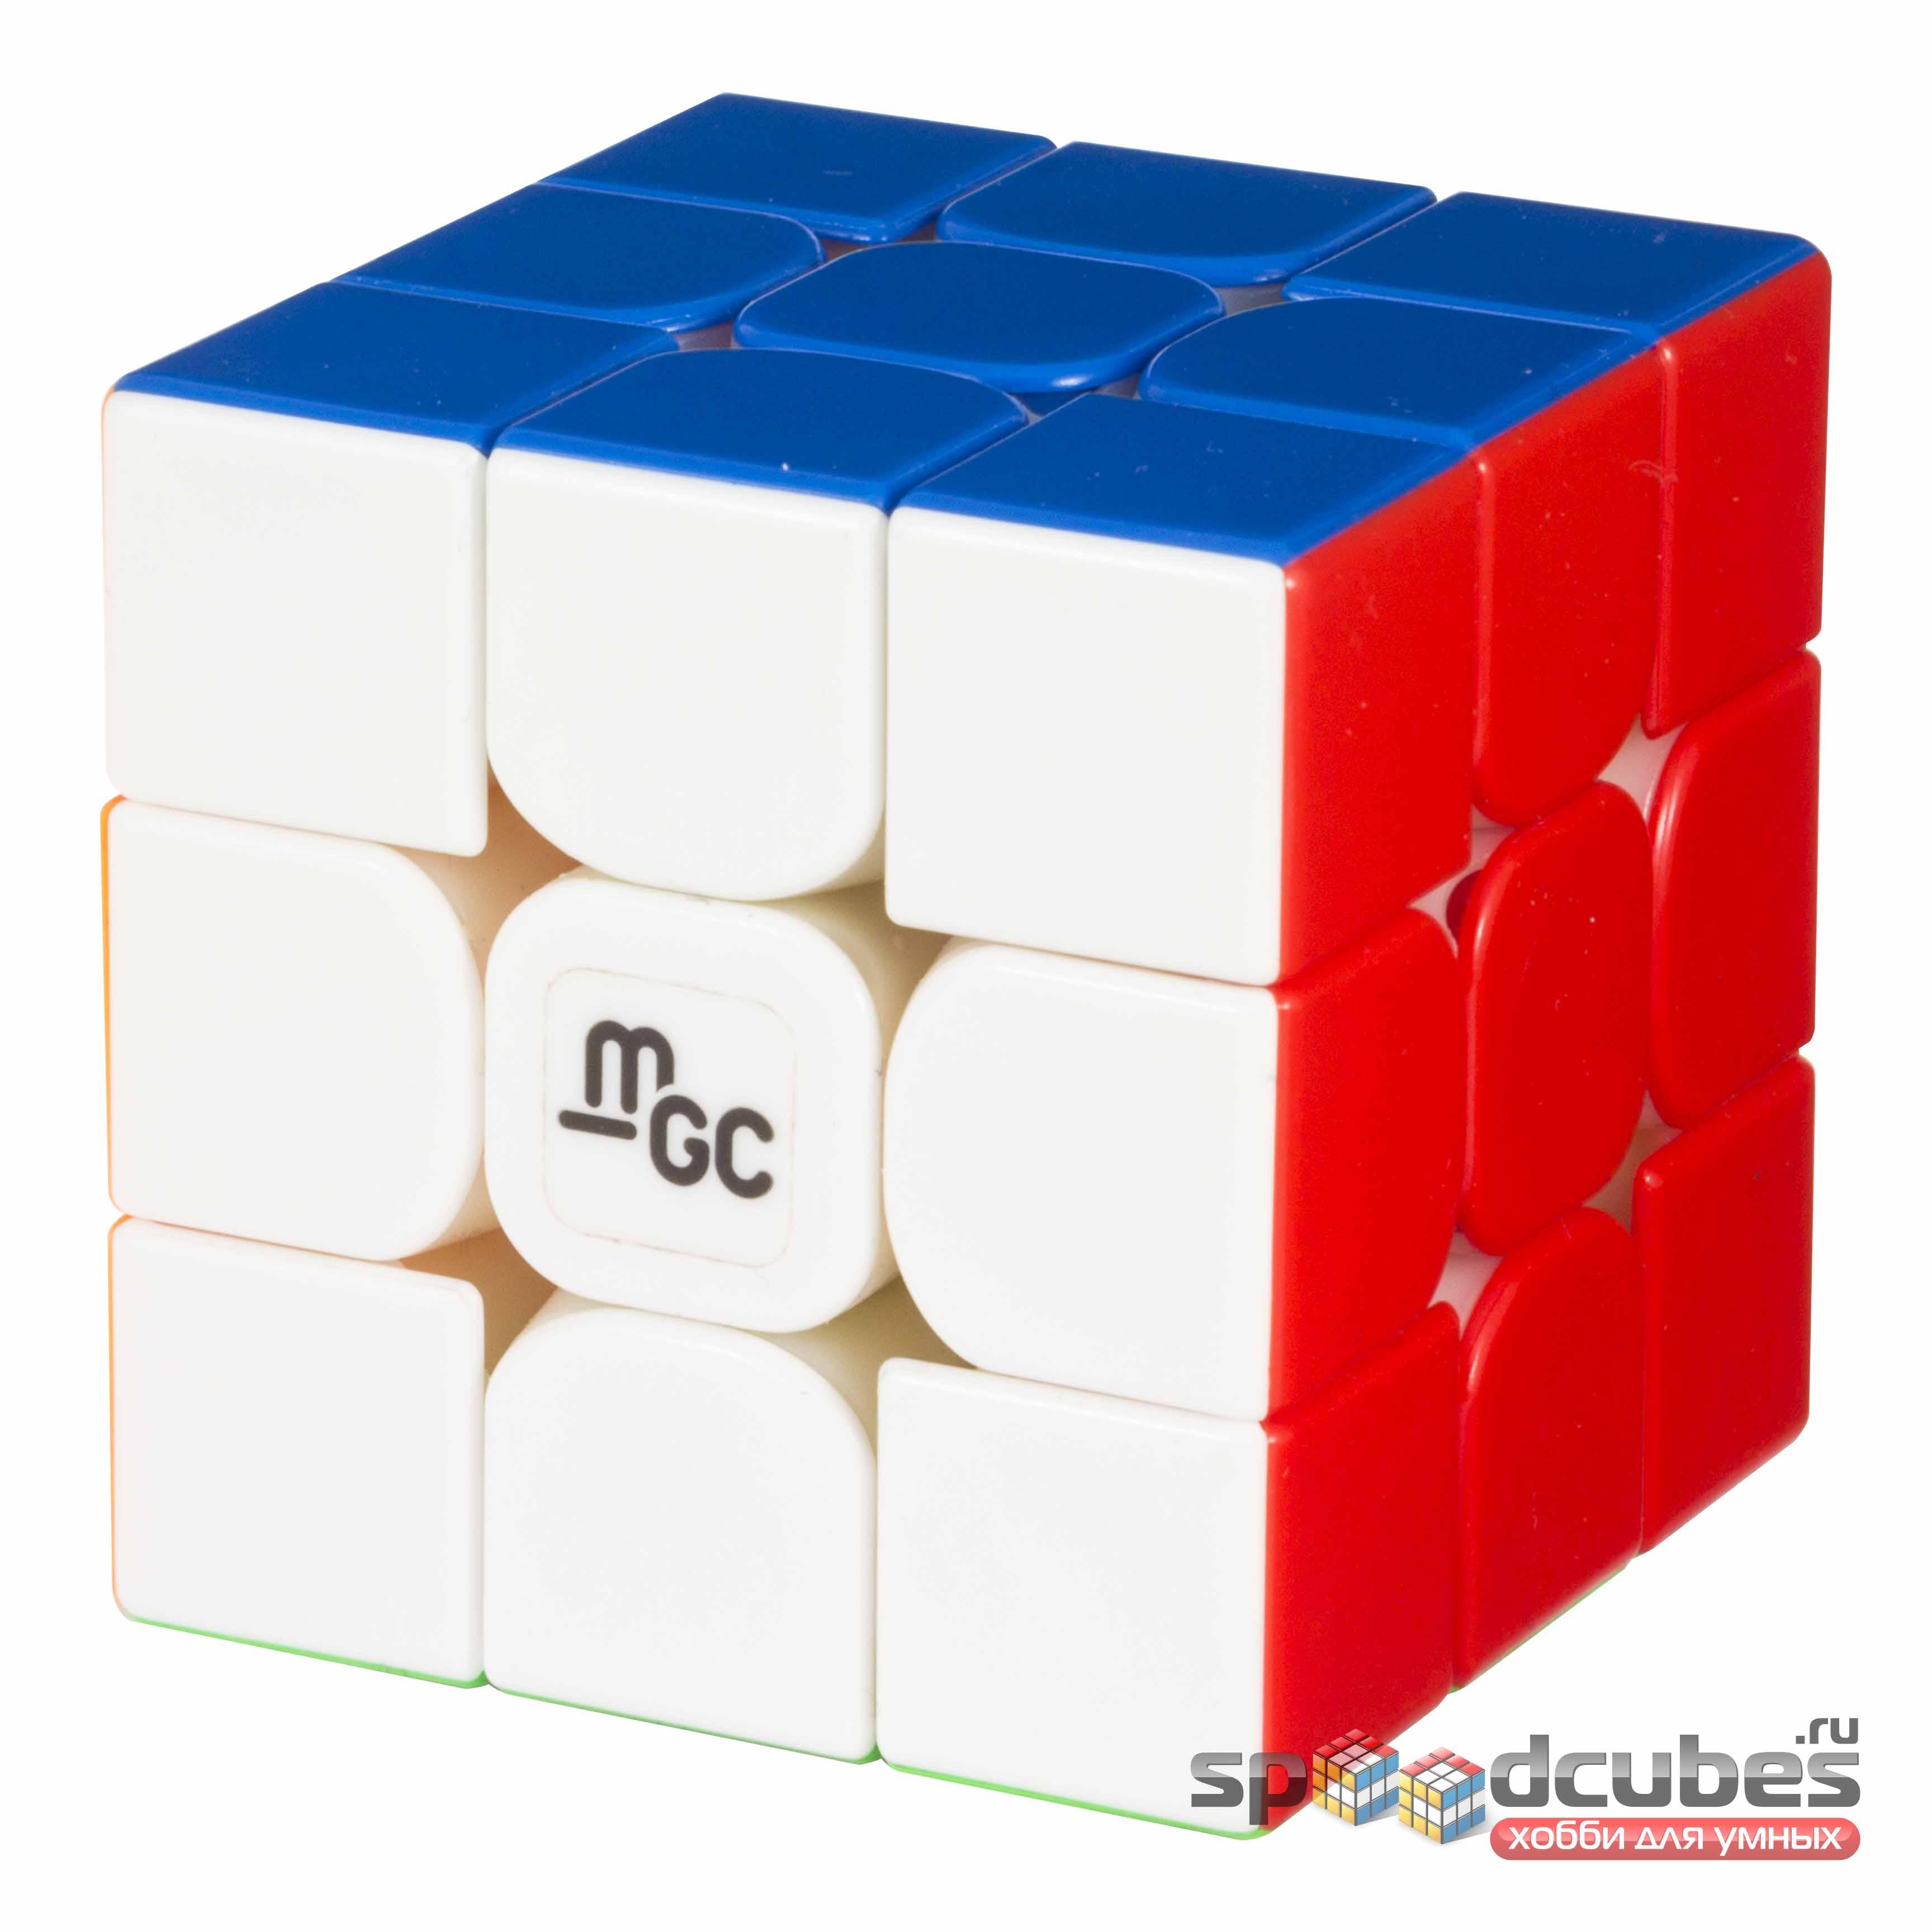 YJ MGC 3x3x3 V2 Color 2